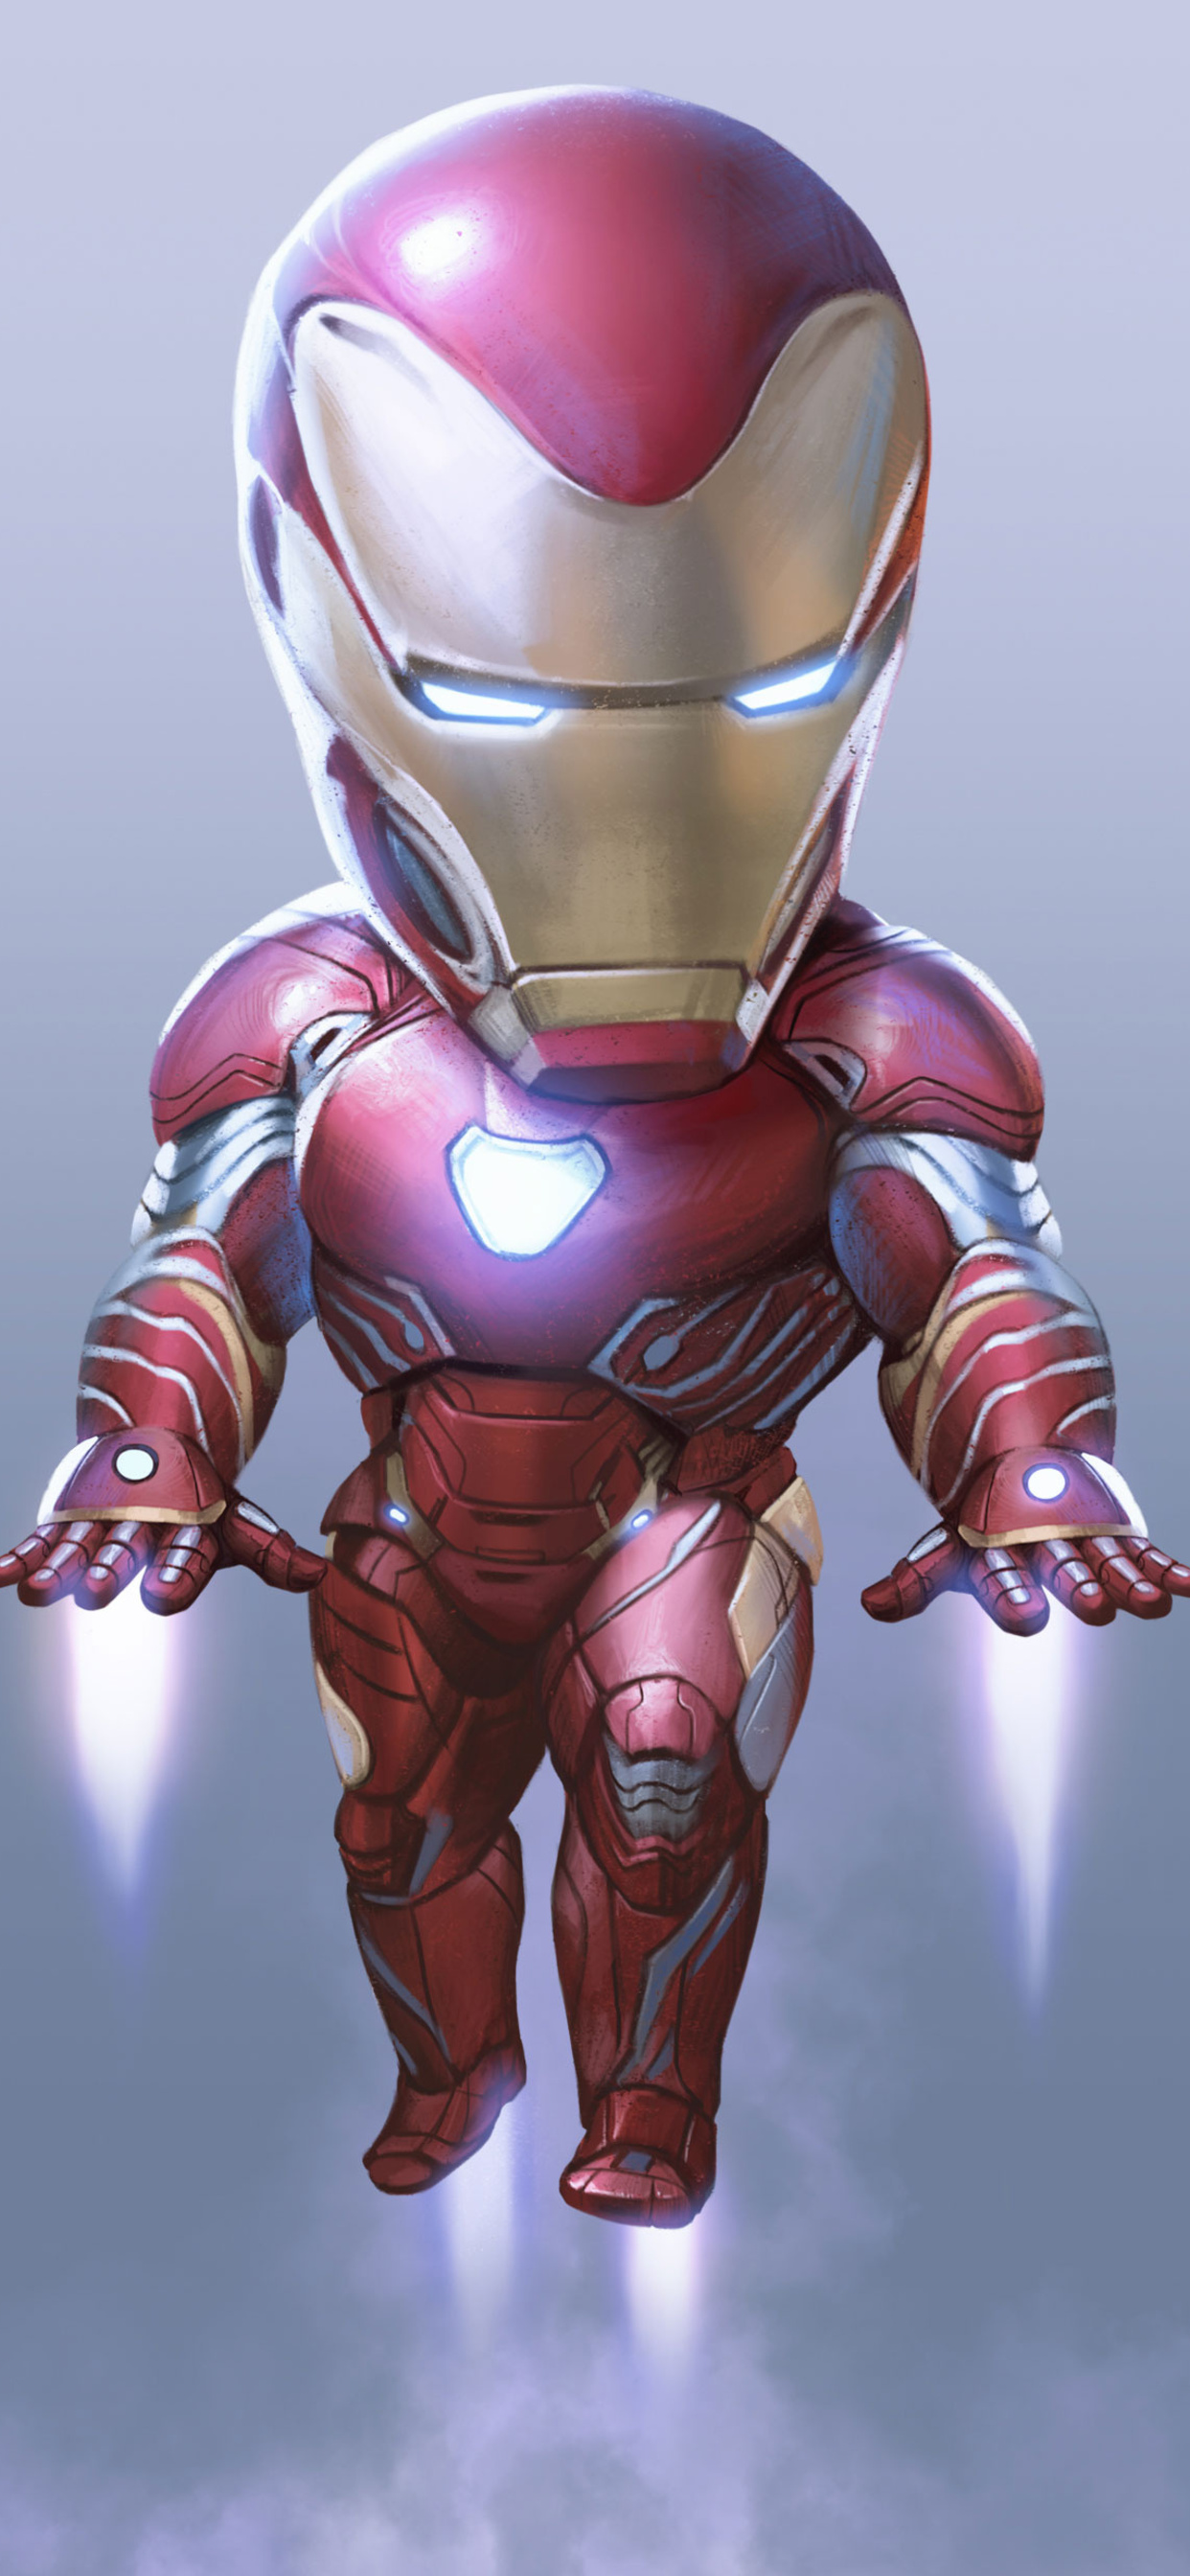 captain-america-thanos-iron-man-avengers-infinity-war-artwork-3r.jpg